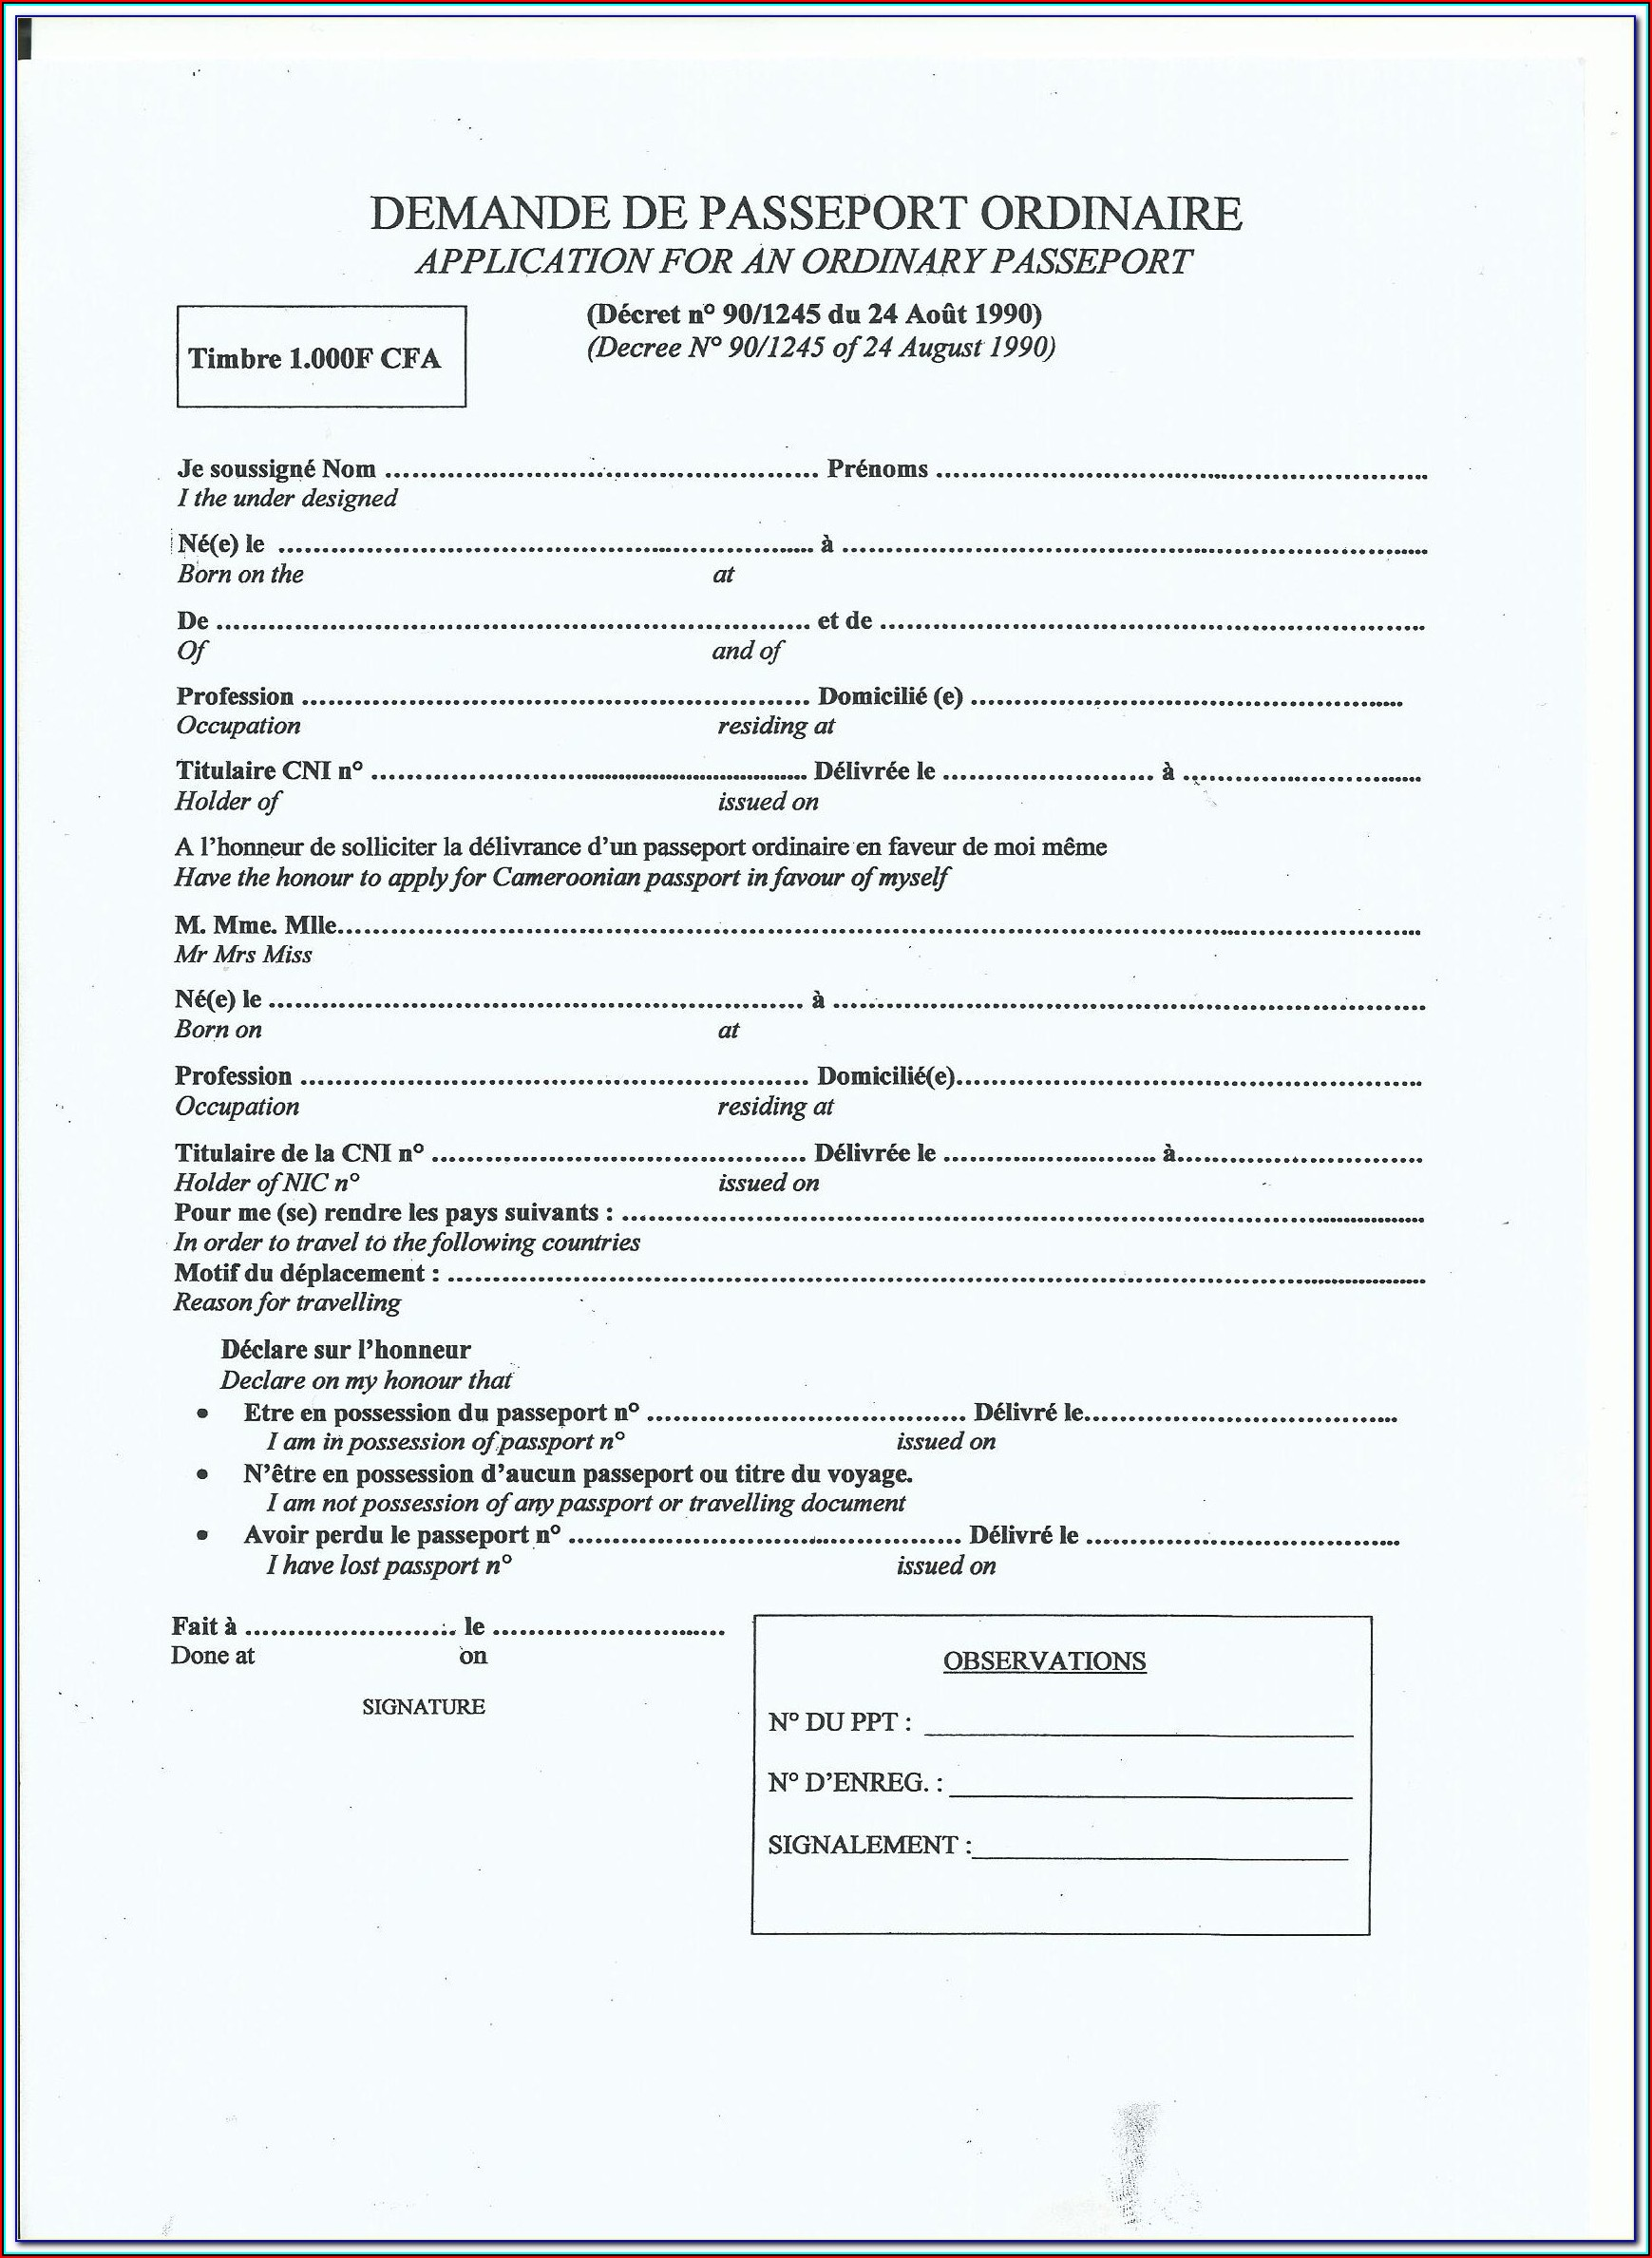 British Passport Renewal Form Download